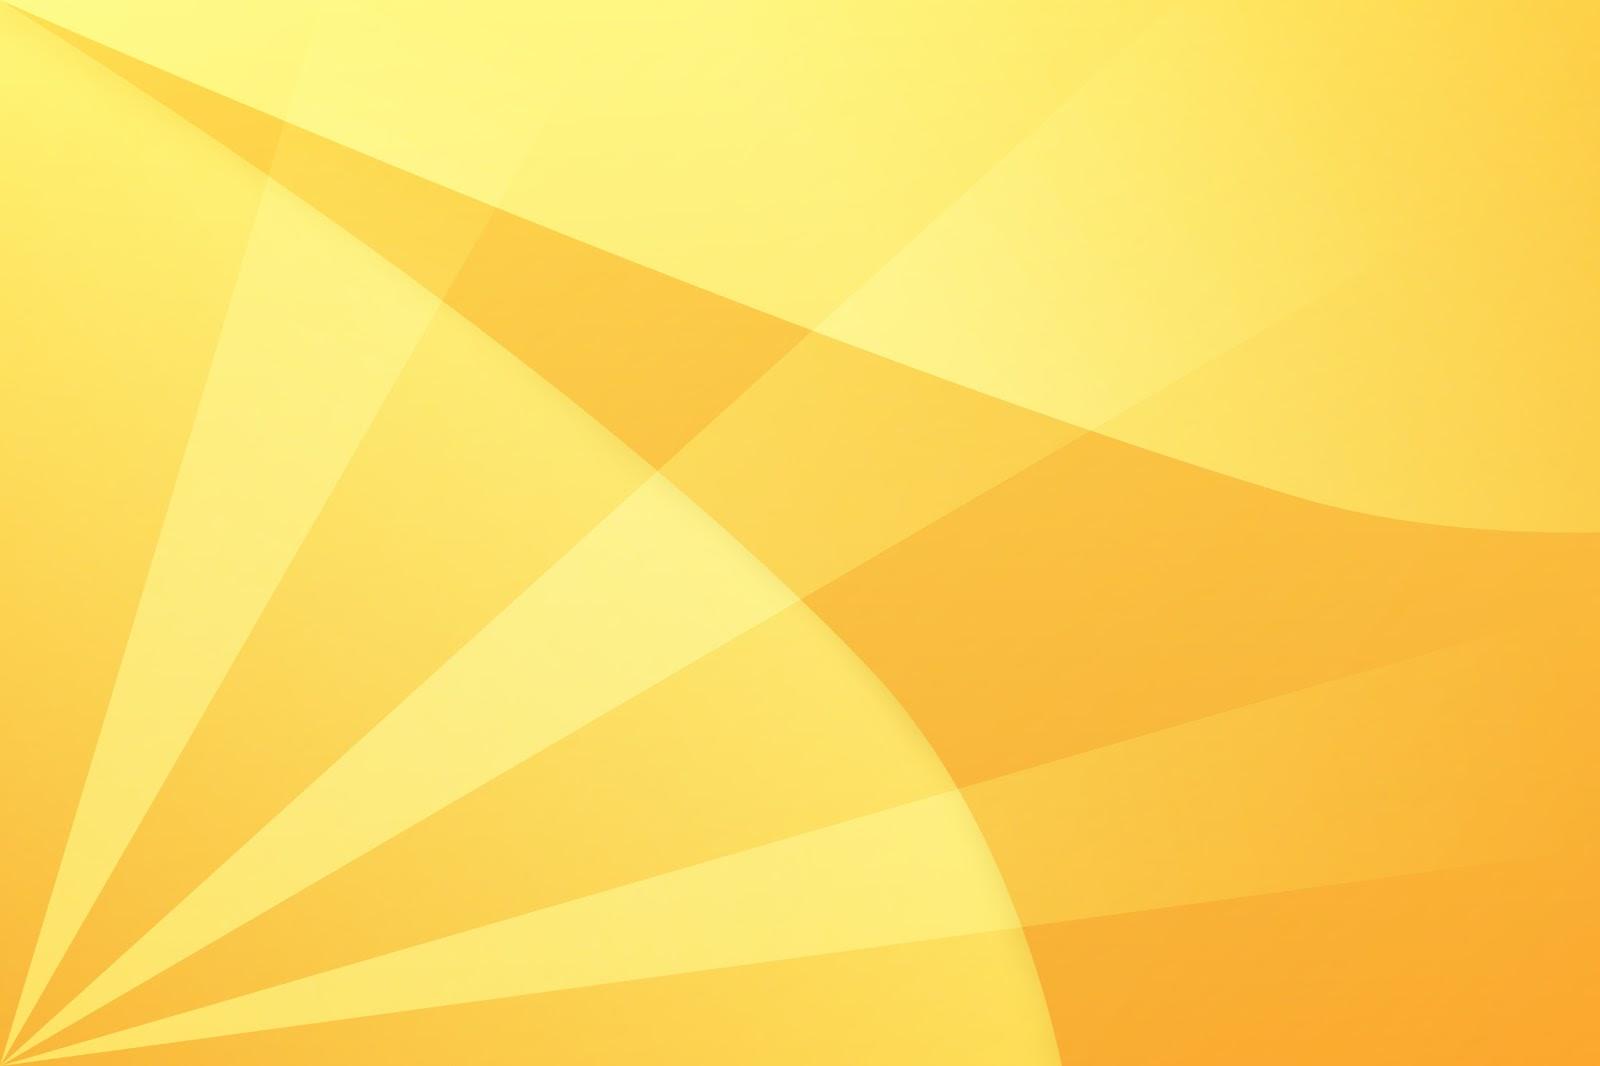 Fall Hd Wallpaper Free Almighty Yellowphant